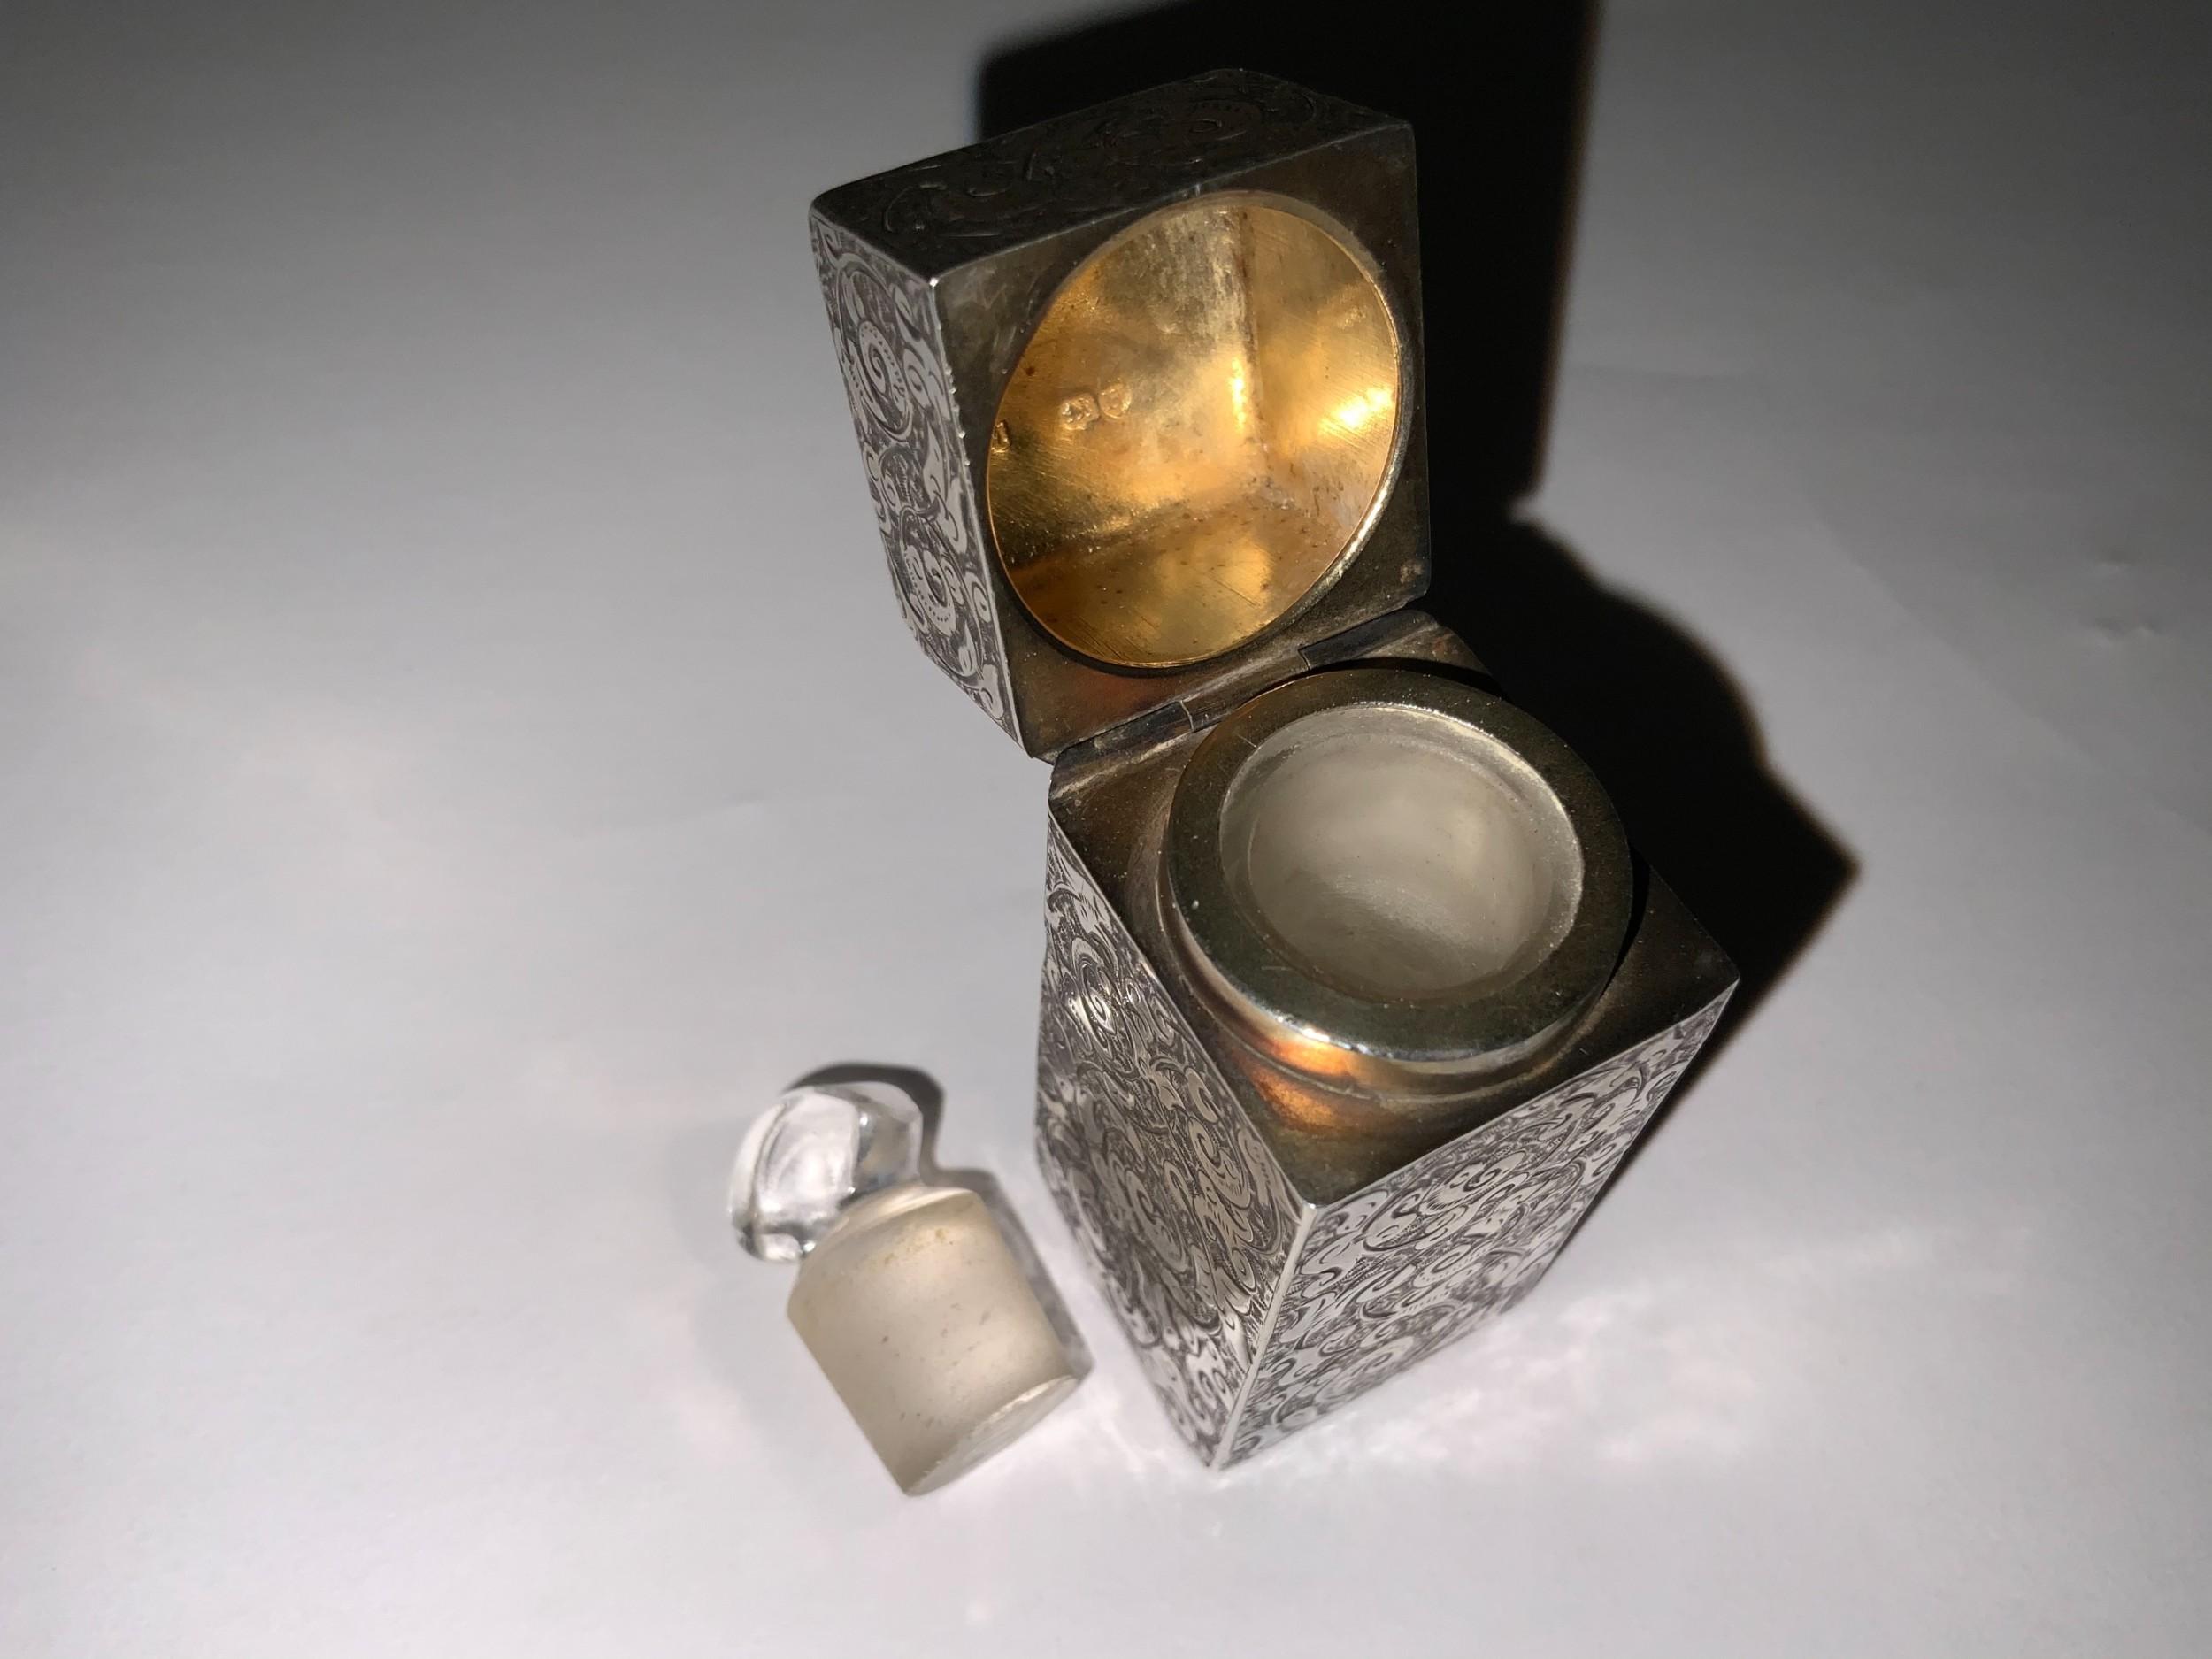 square sampson mordan silver scentperfume bottle